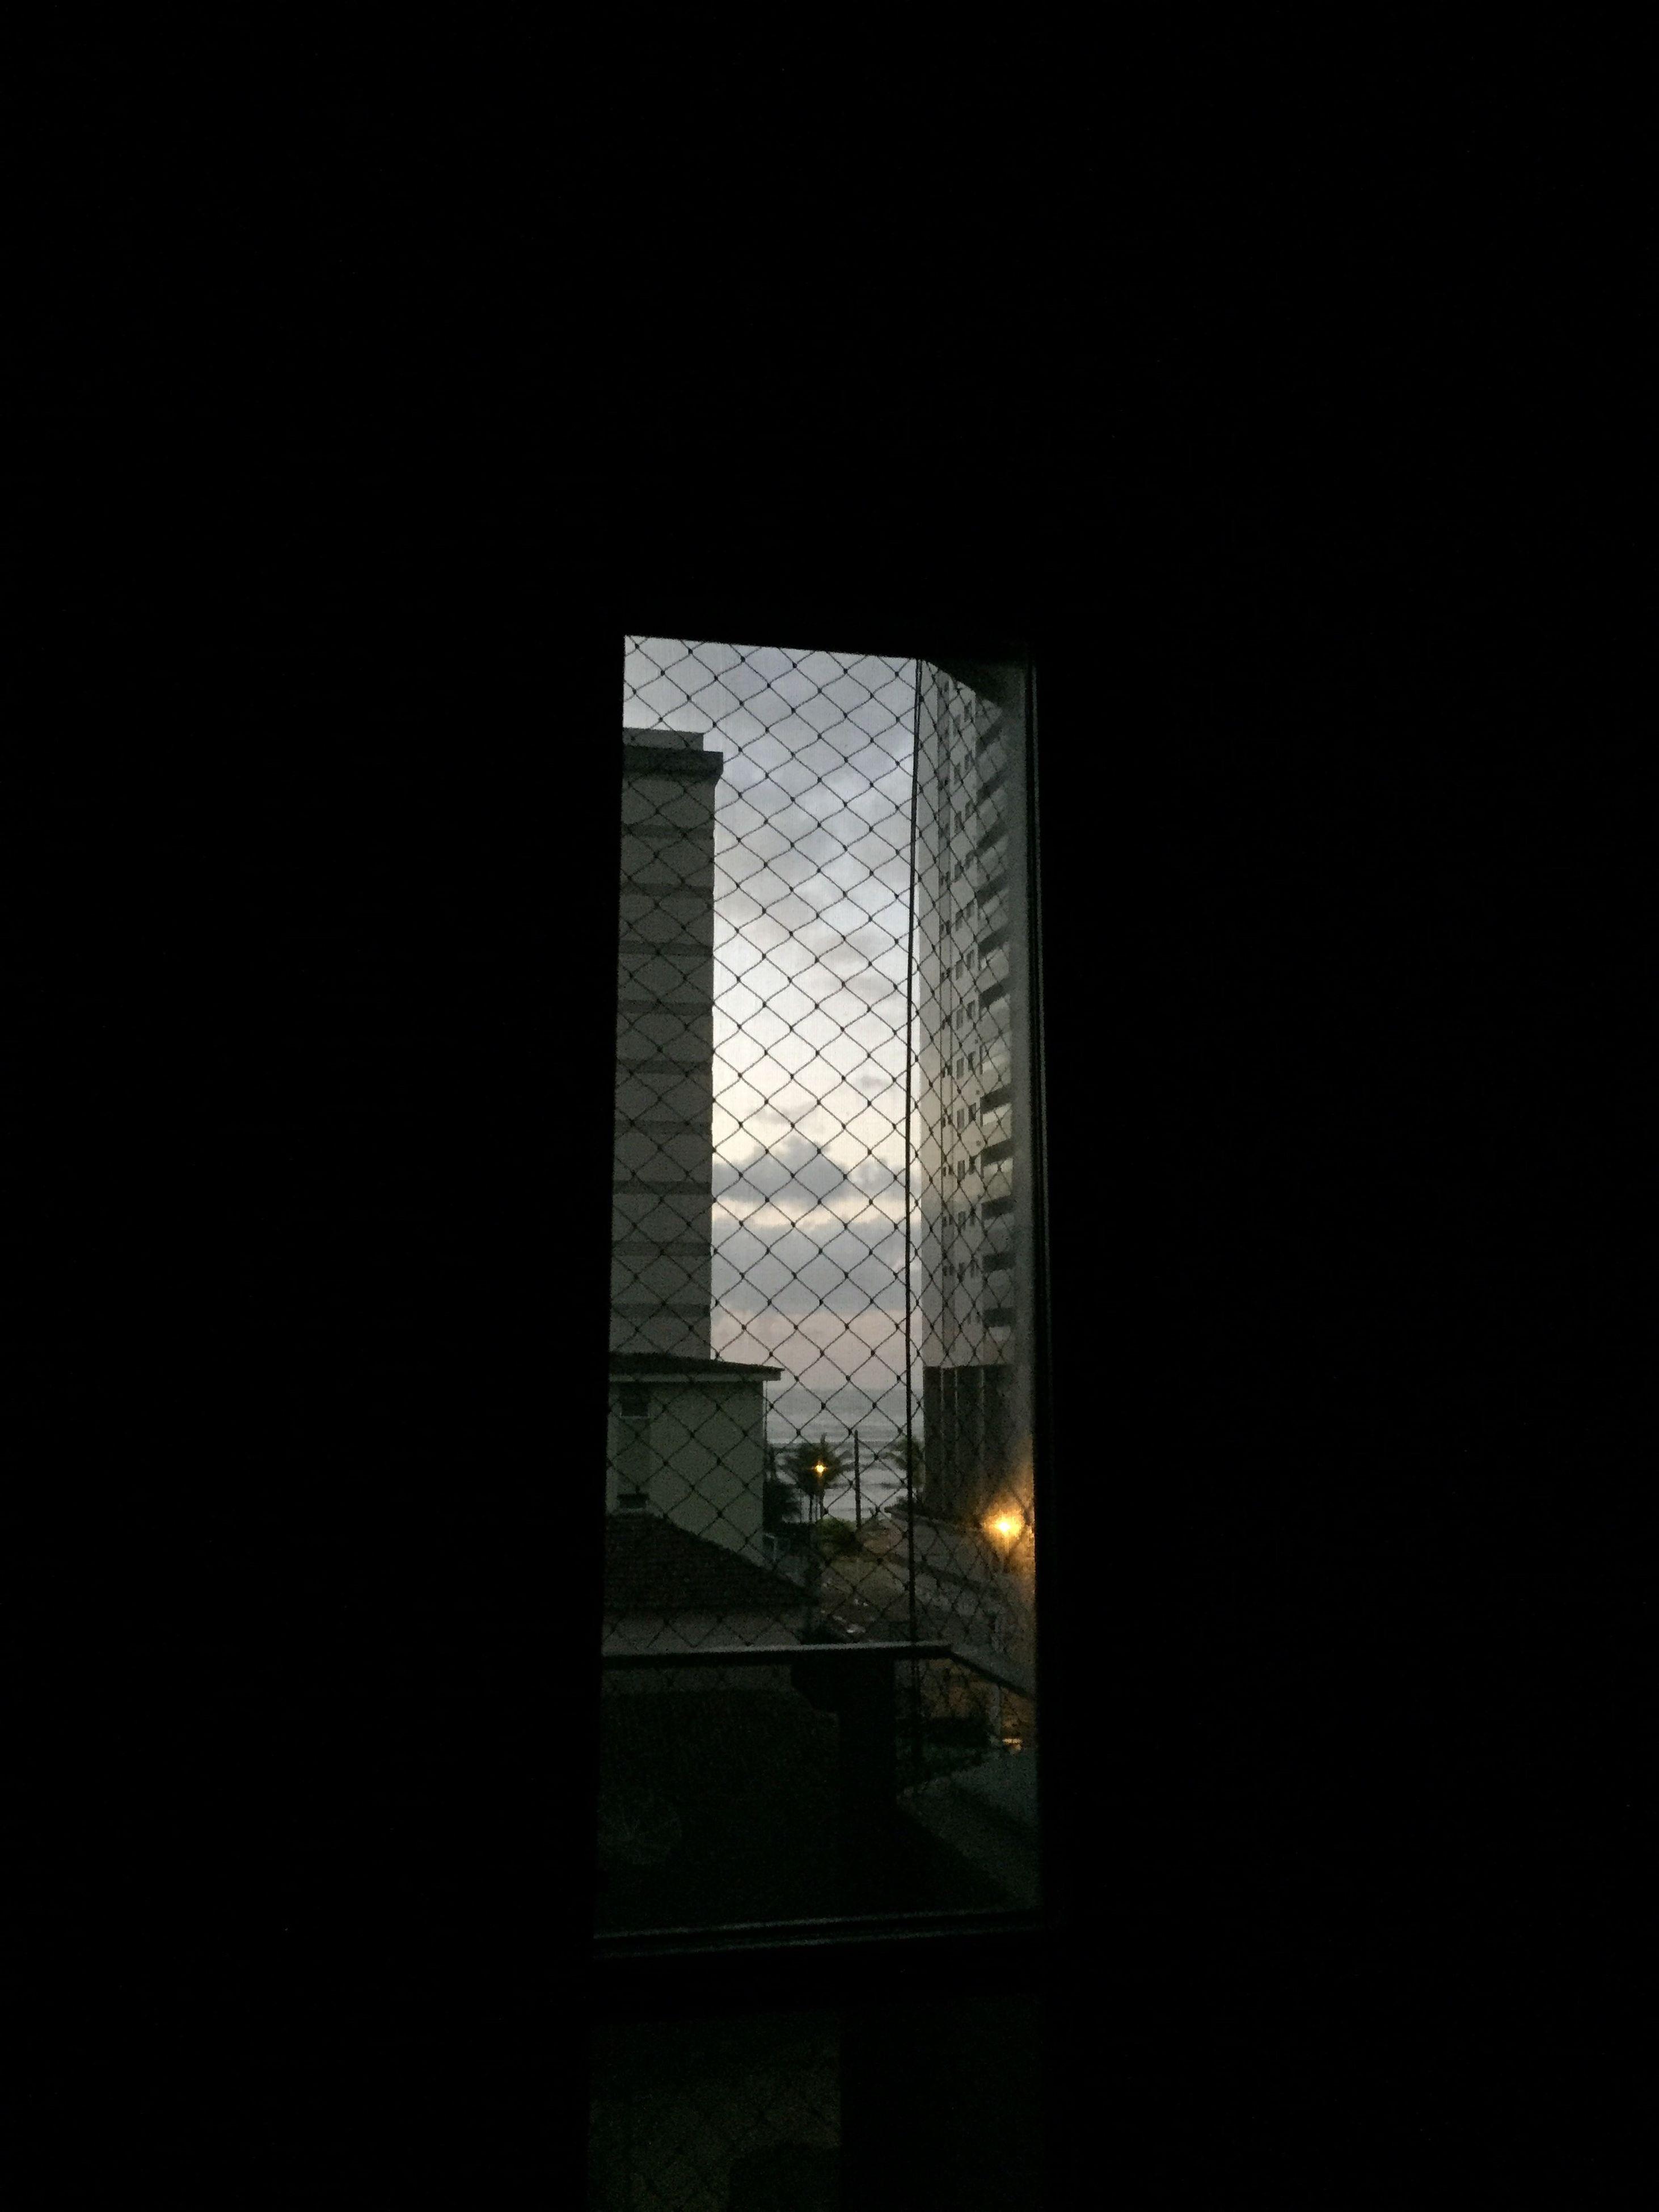 window, indoors, dark, illuminated, sky, tall, darkroom, no people, darkness